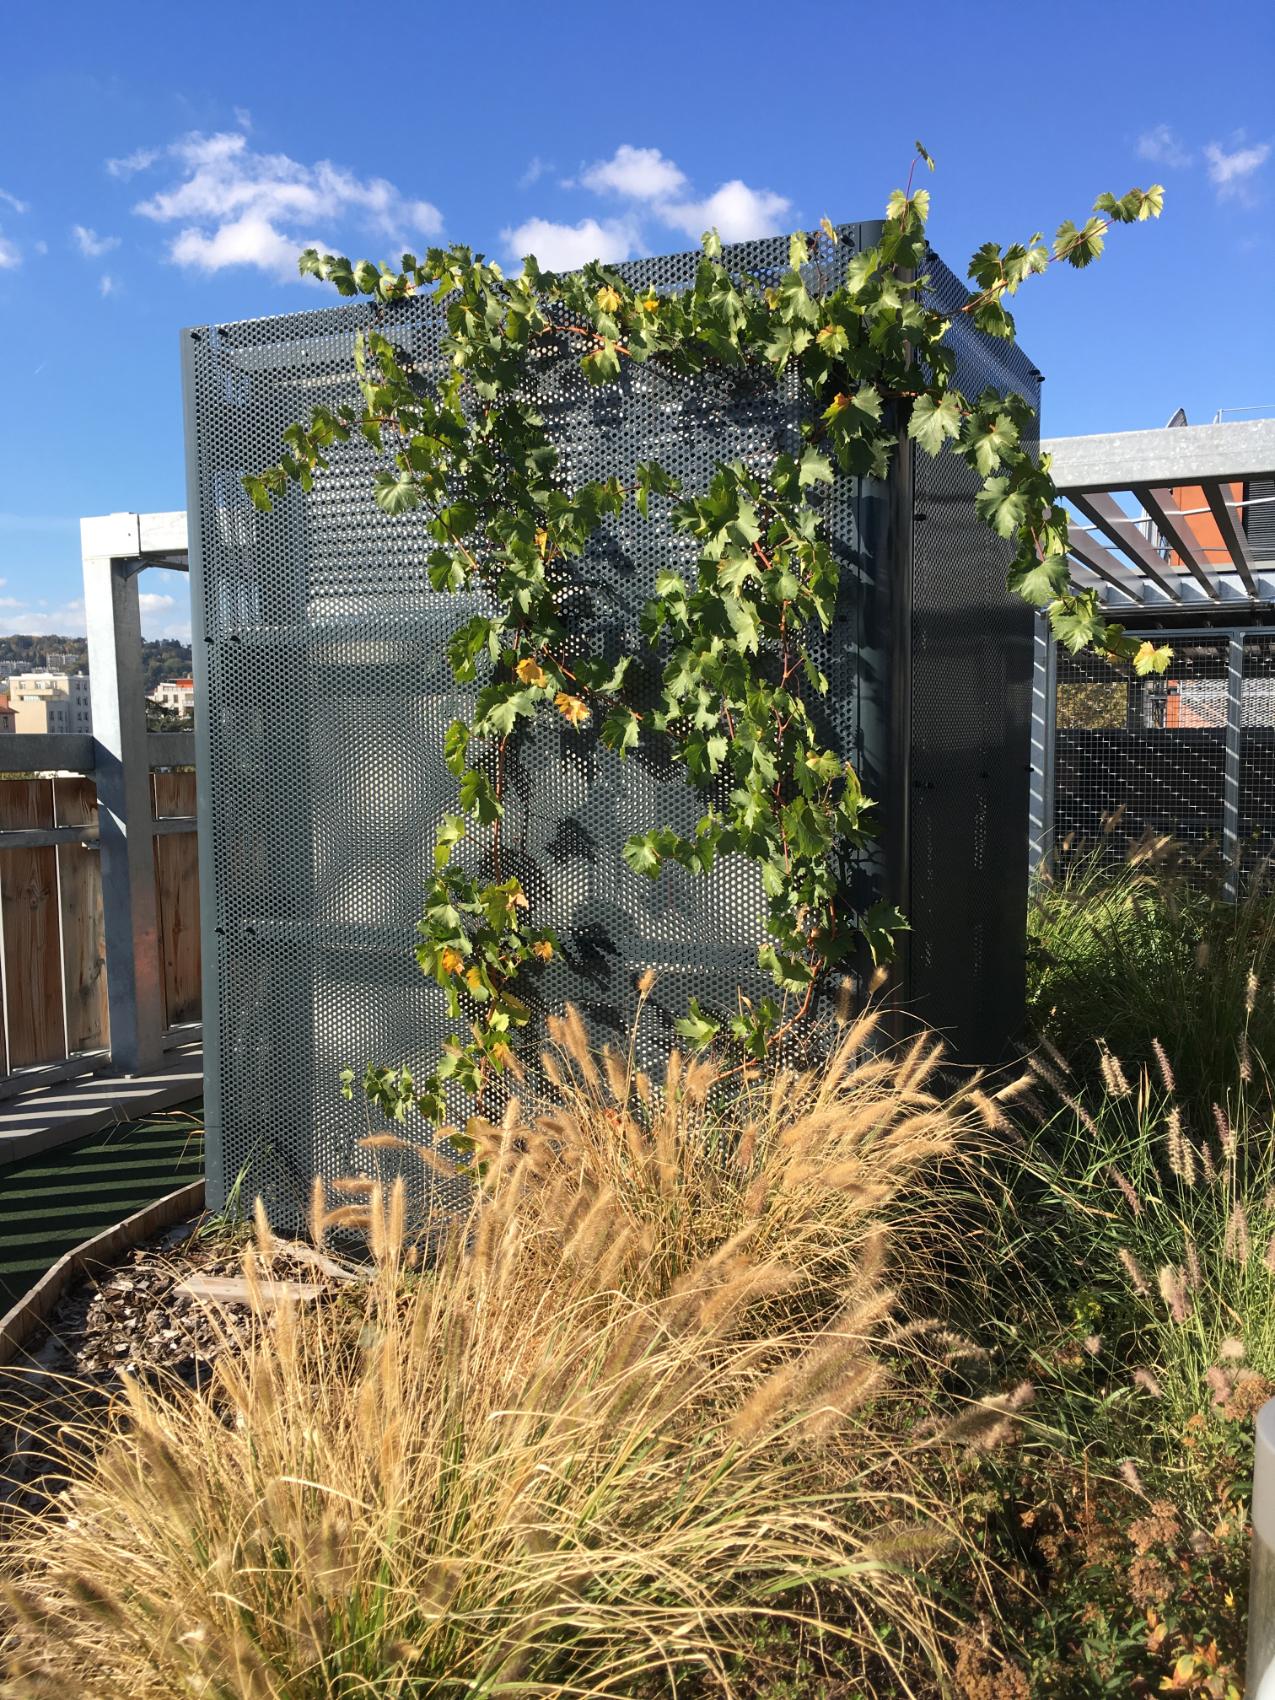 IMG-PRI-Girondines-jardin_terrasse011-G.ATHANASE_10-2017-CC